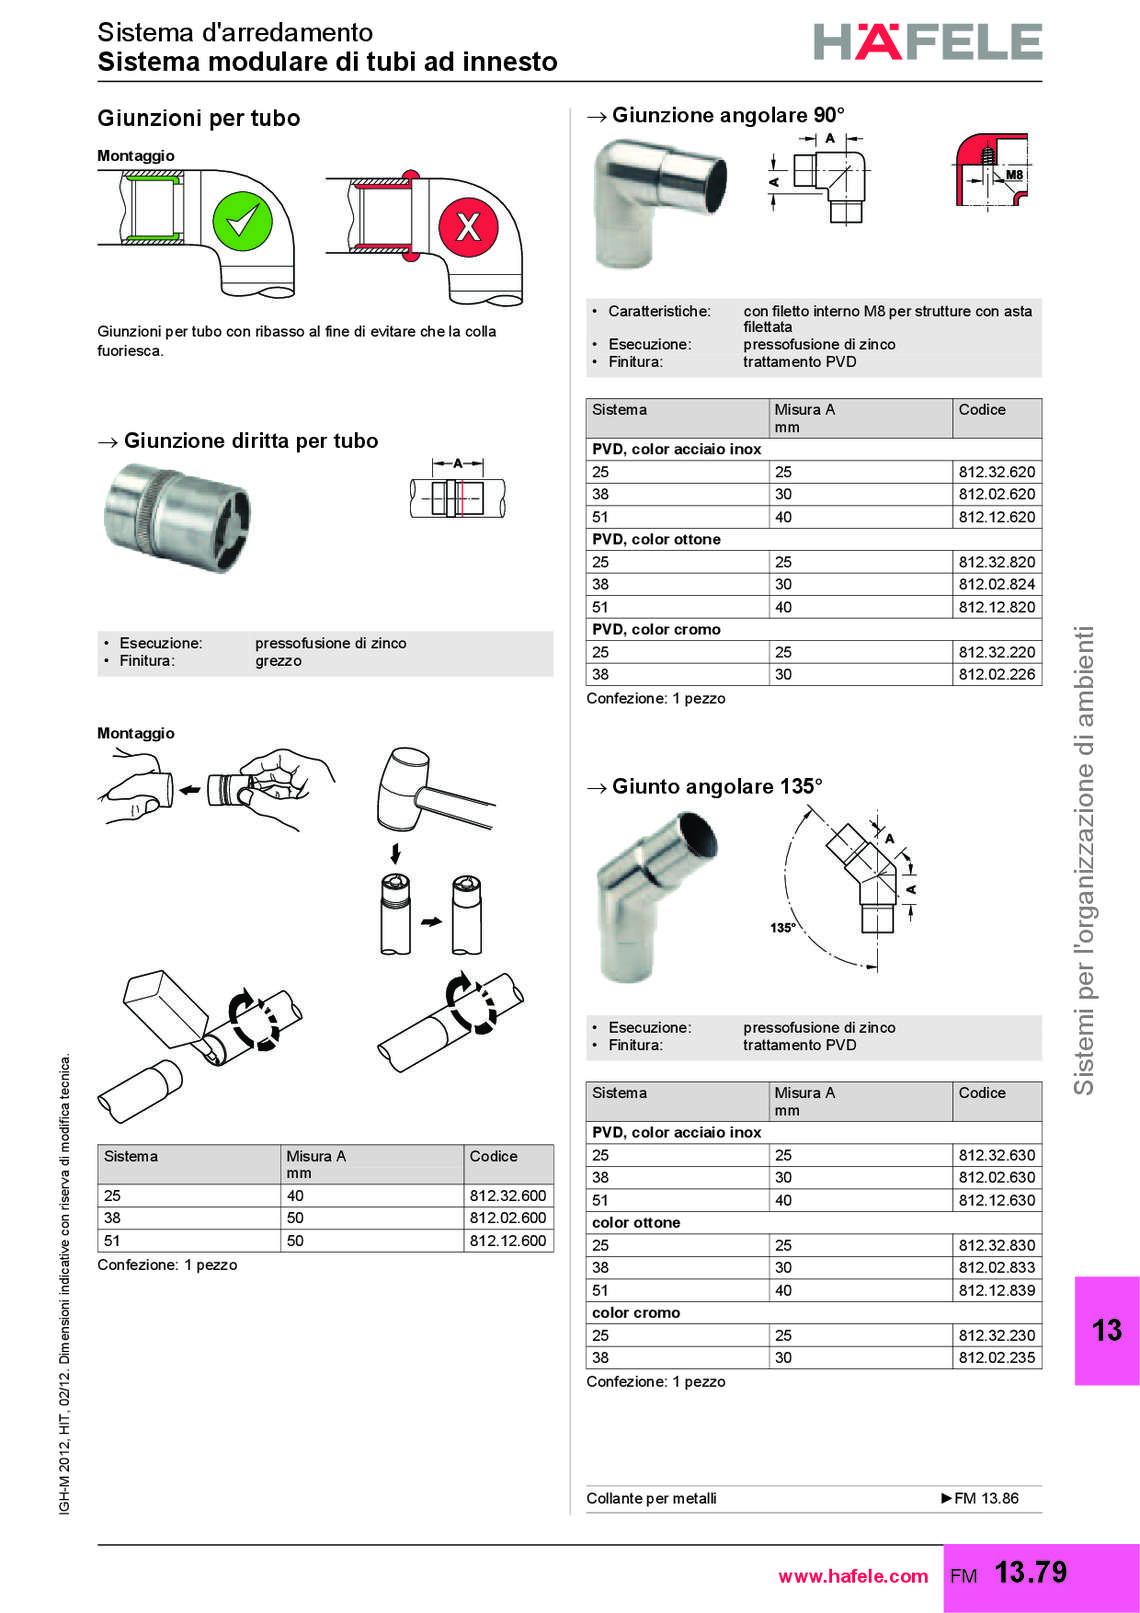 hafele-arredo-negozi-e-farmacie_32_090.jpg